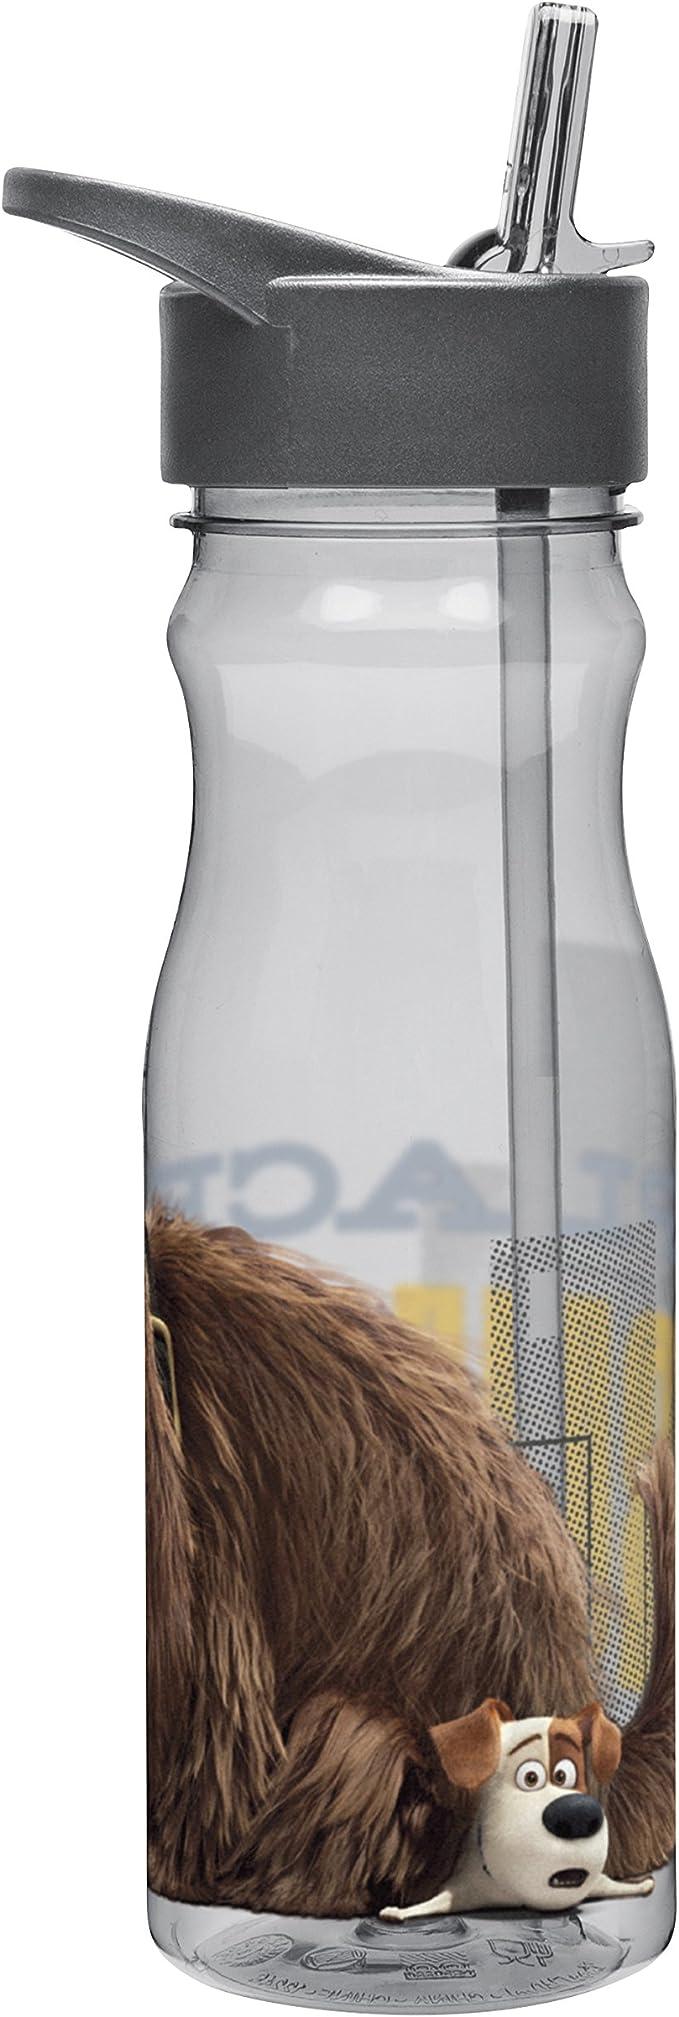 Water Bottle with Straw Zak Designs SLPA-P280 Secret Life of Pets 25 oz Max /& Duke Multicolor